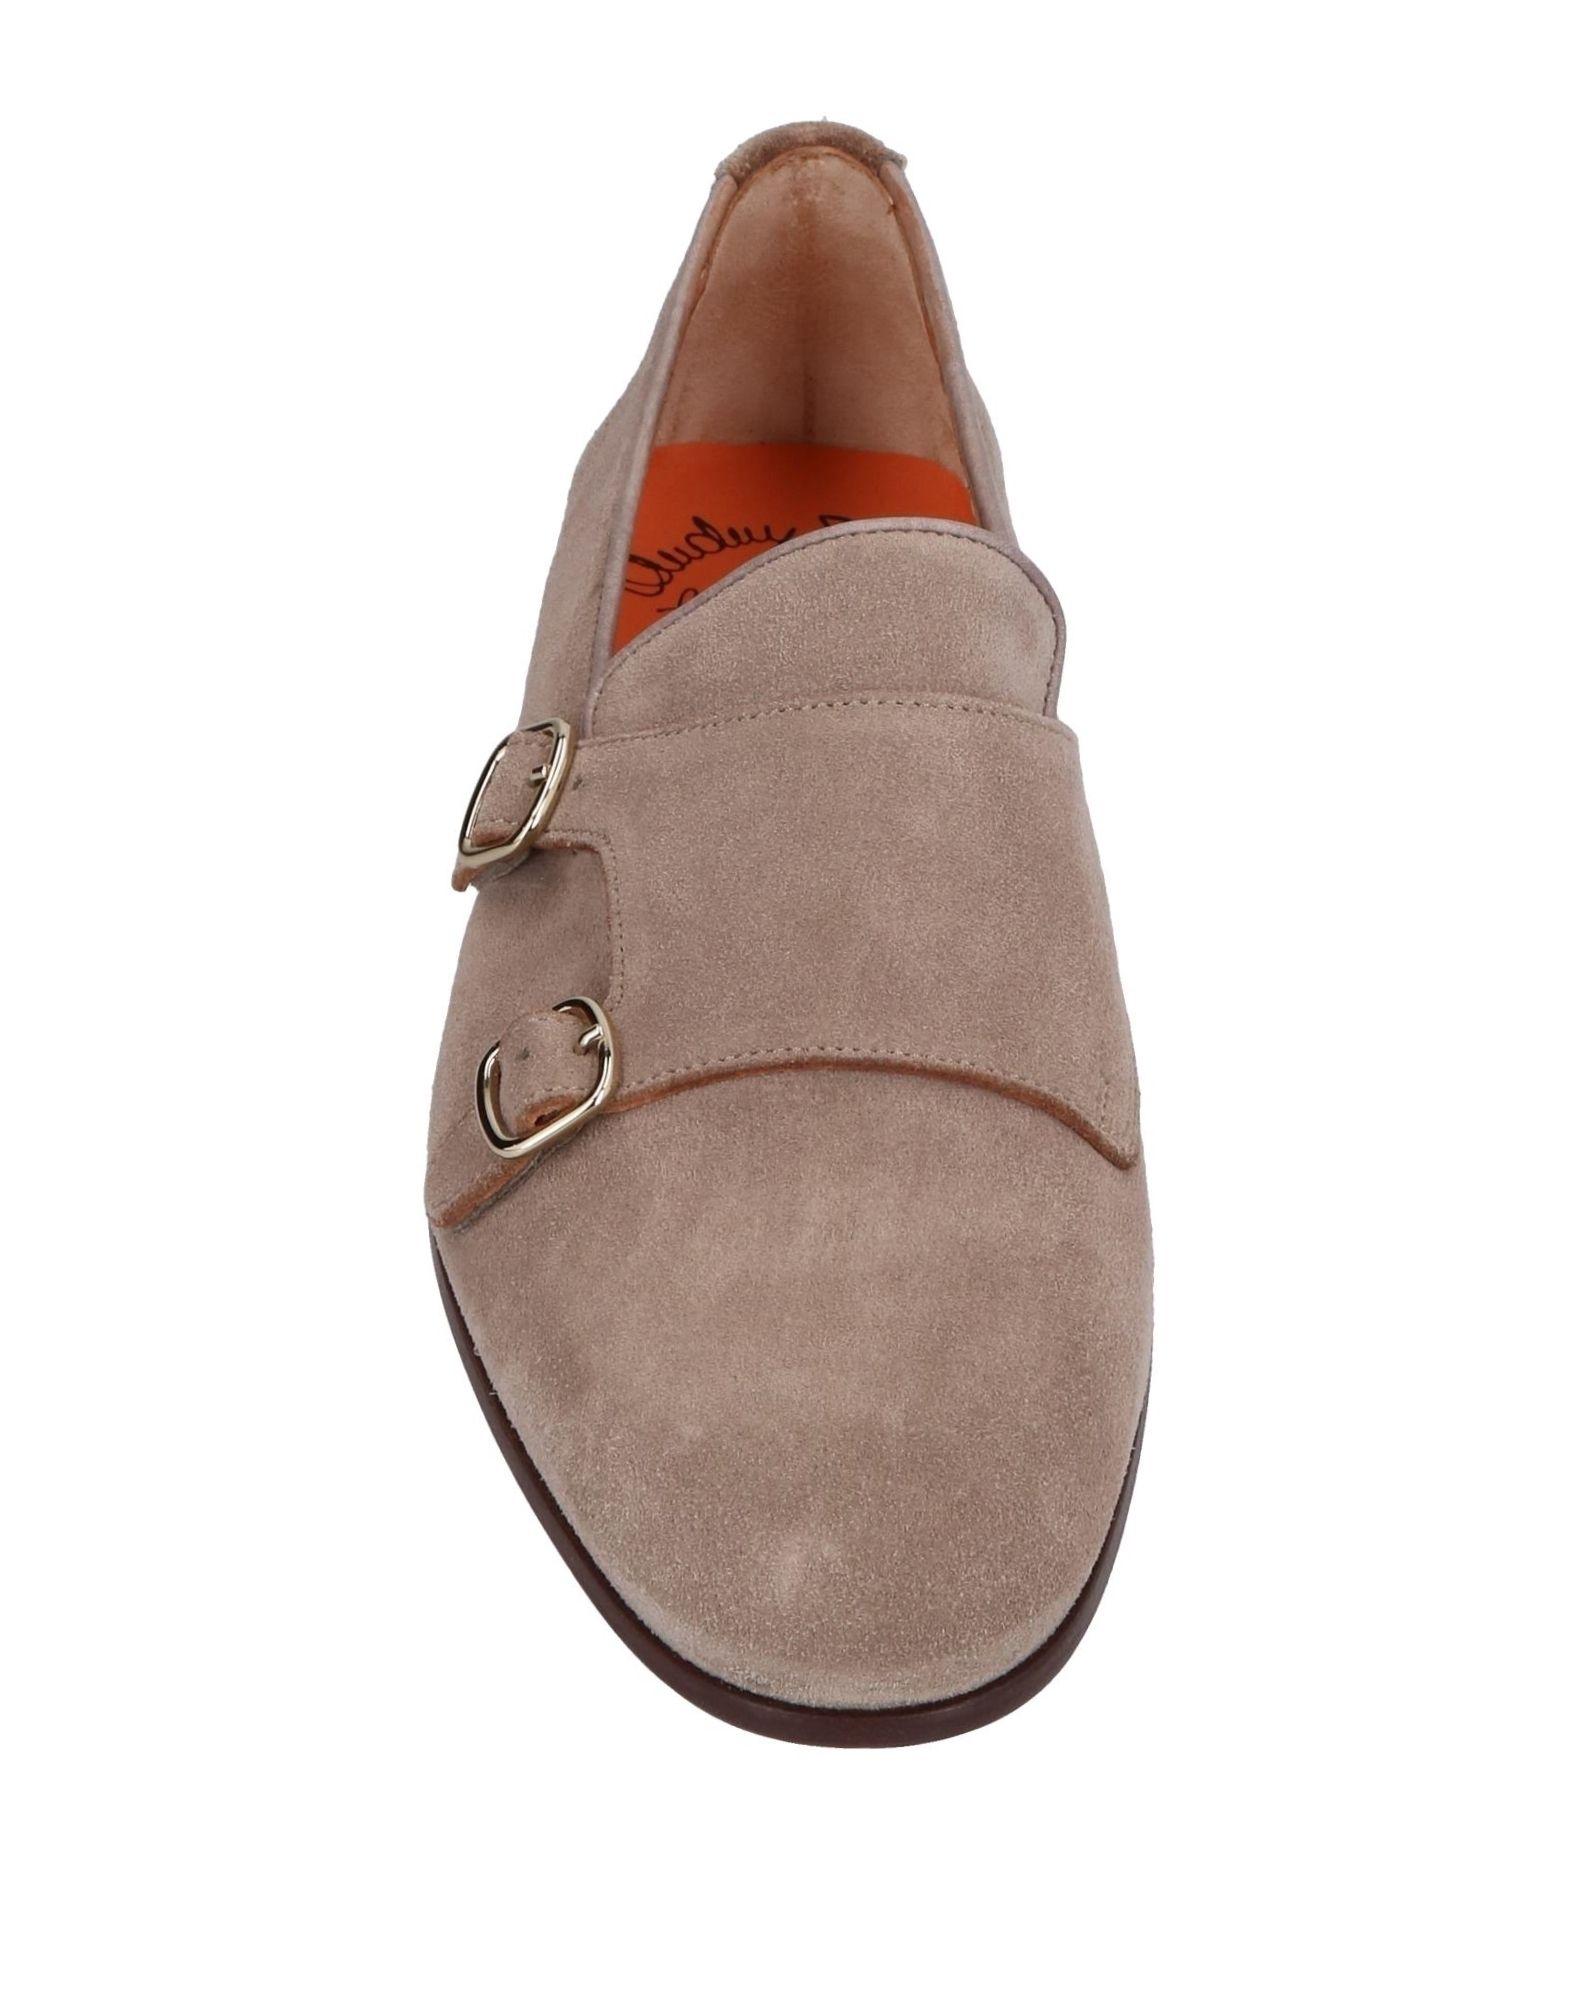 Santoni Gute Mokassins Herren  11183890MN Gute Santoni Qualität beliebte Schuhe 6d70a4